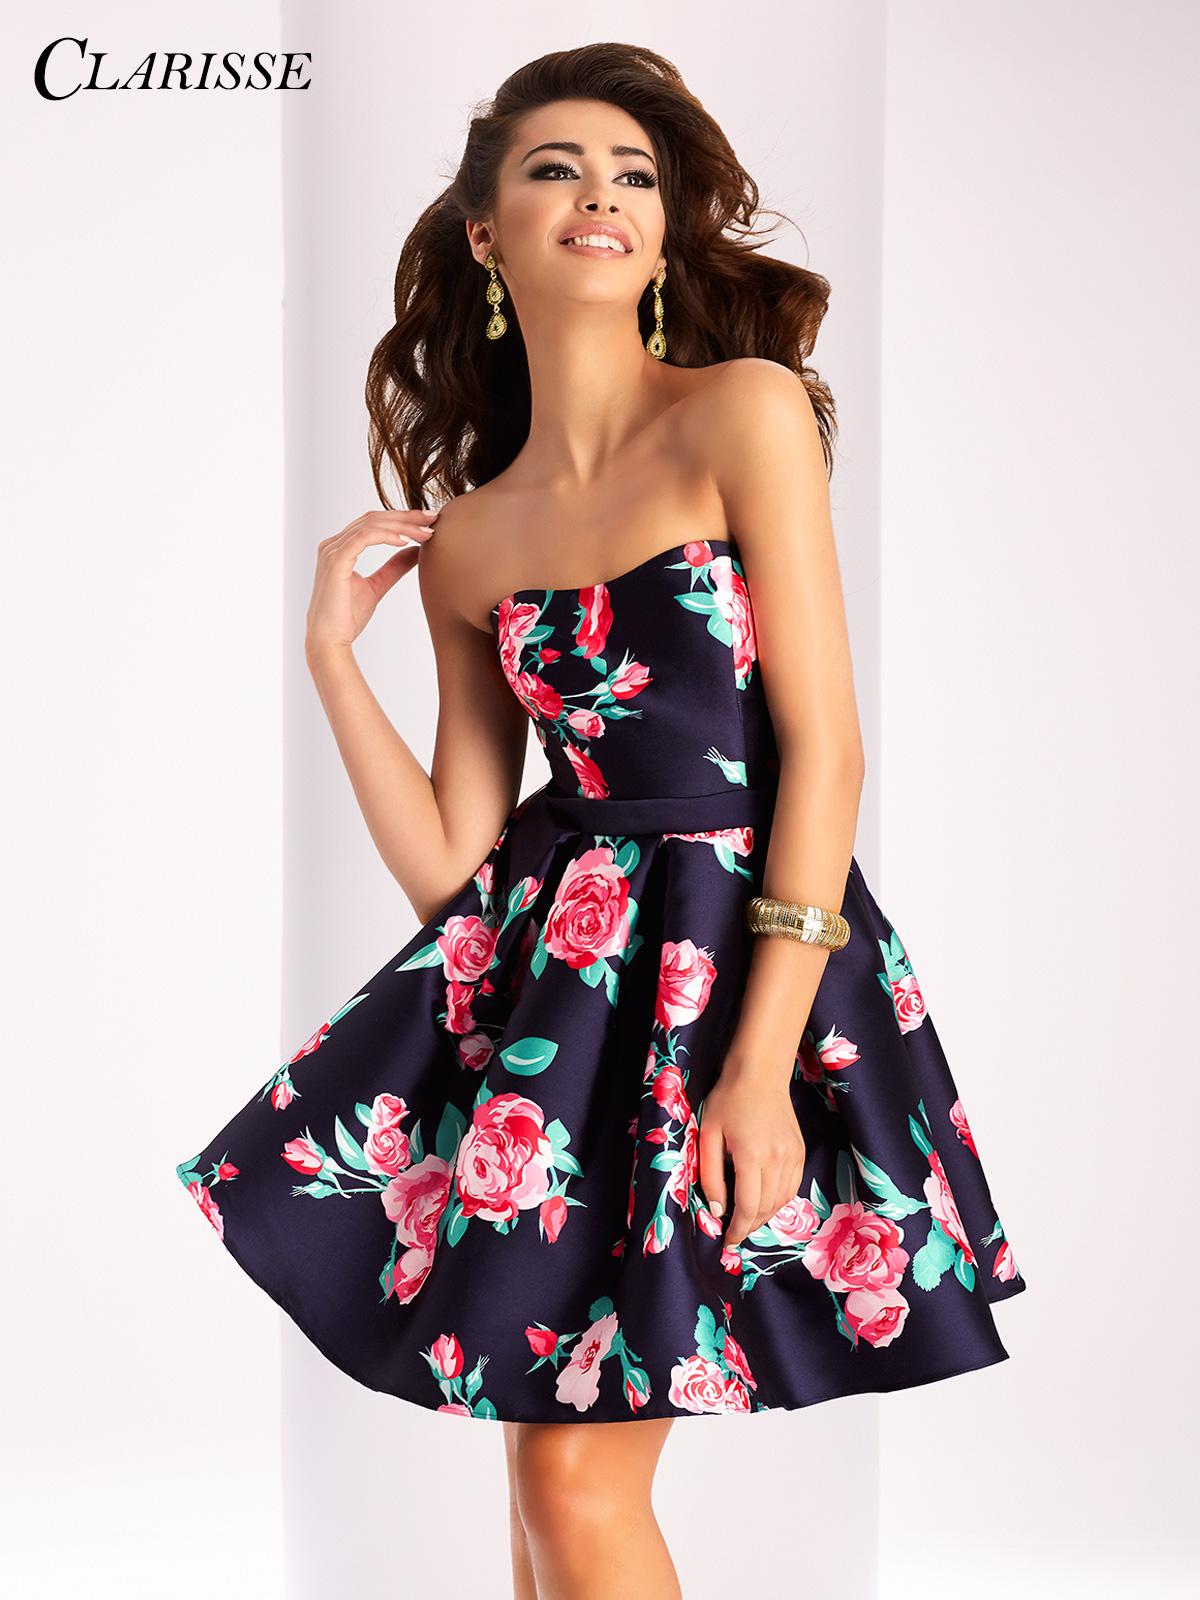 Short Prom Dress clarisse short floral dress 3028 OAECIGD